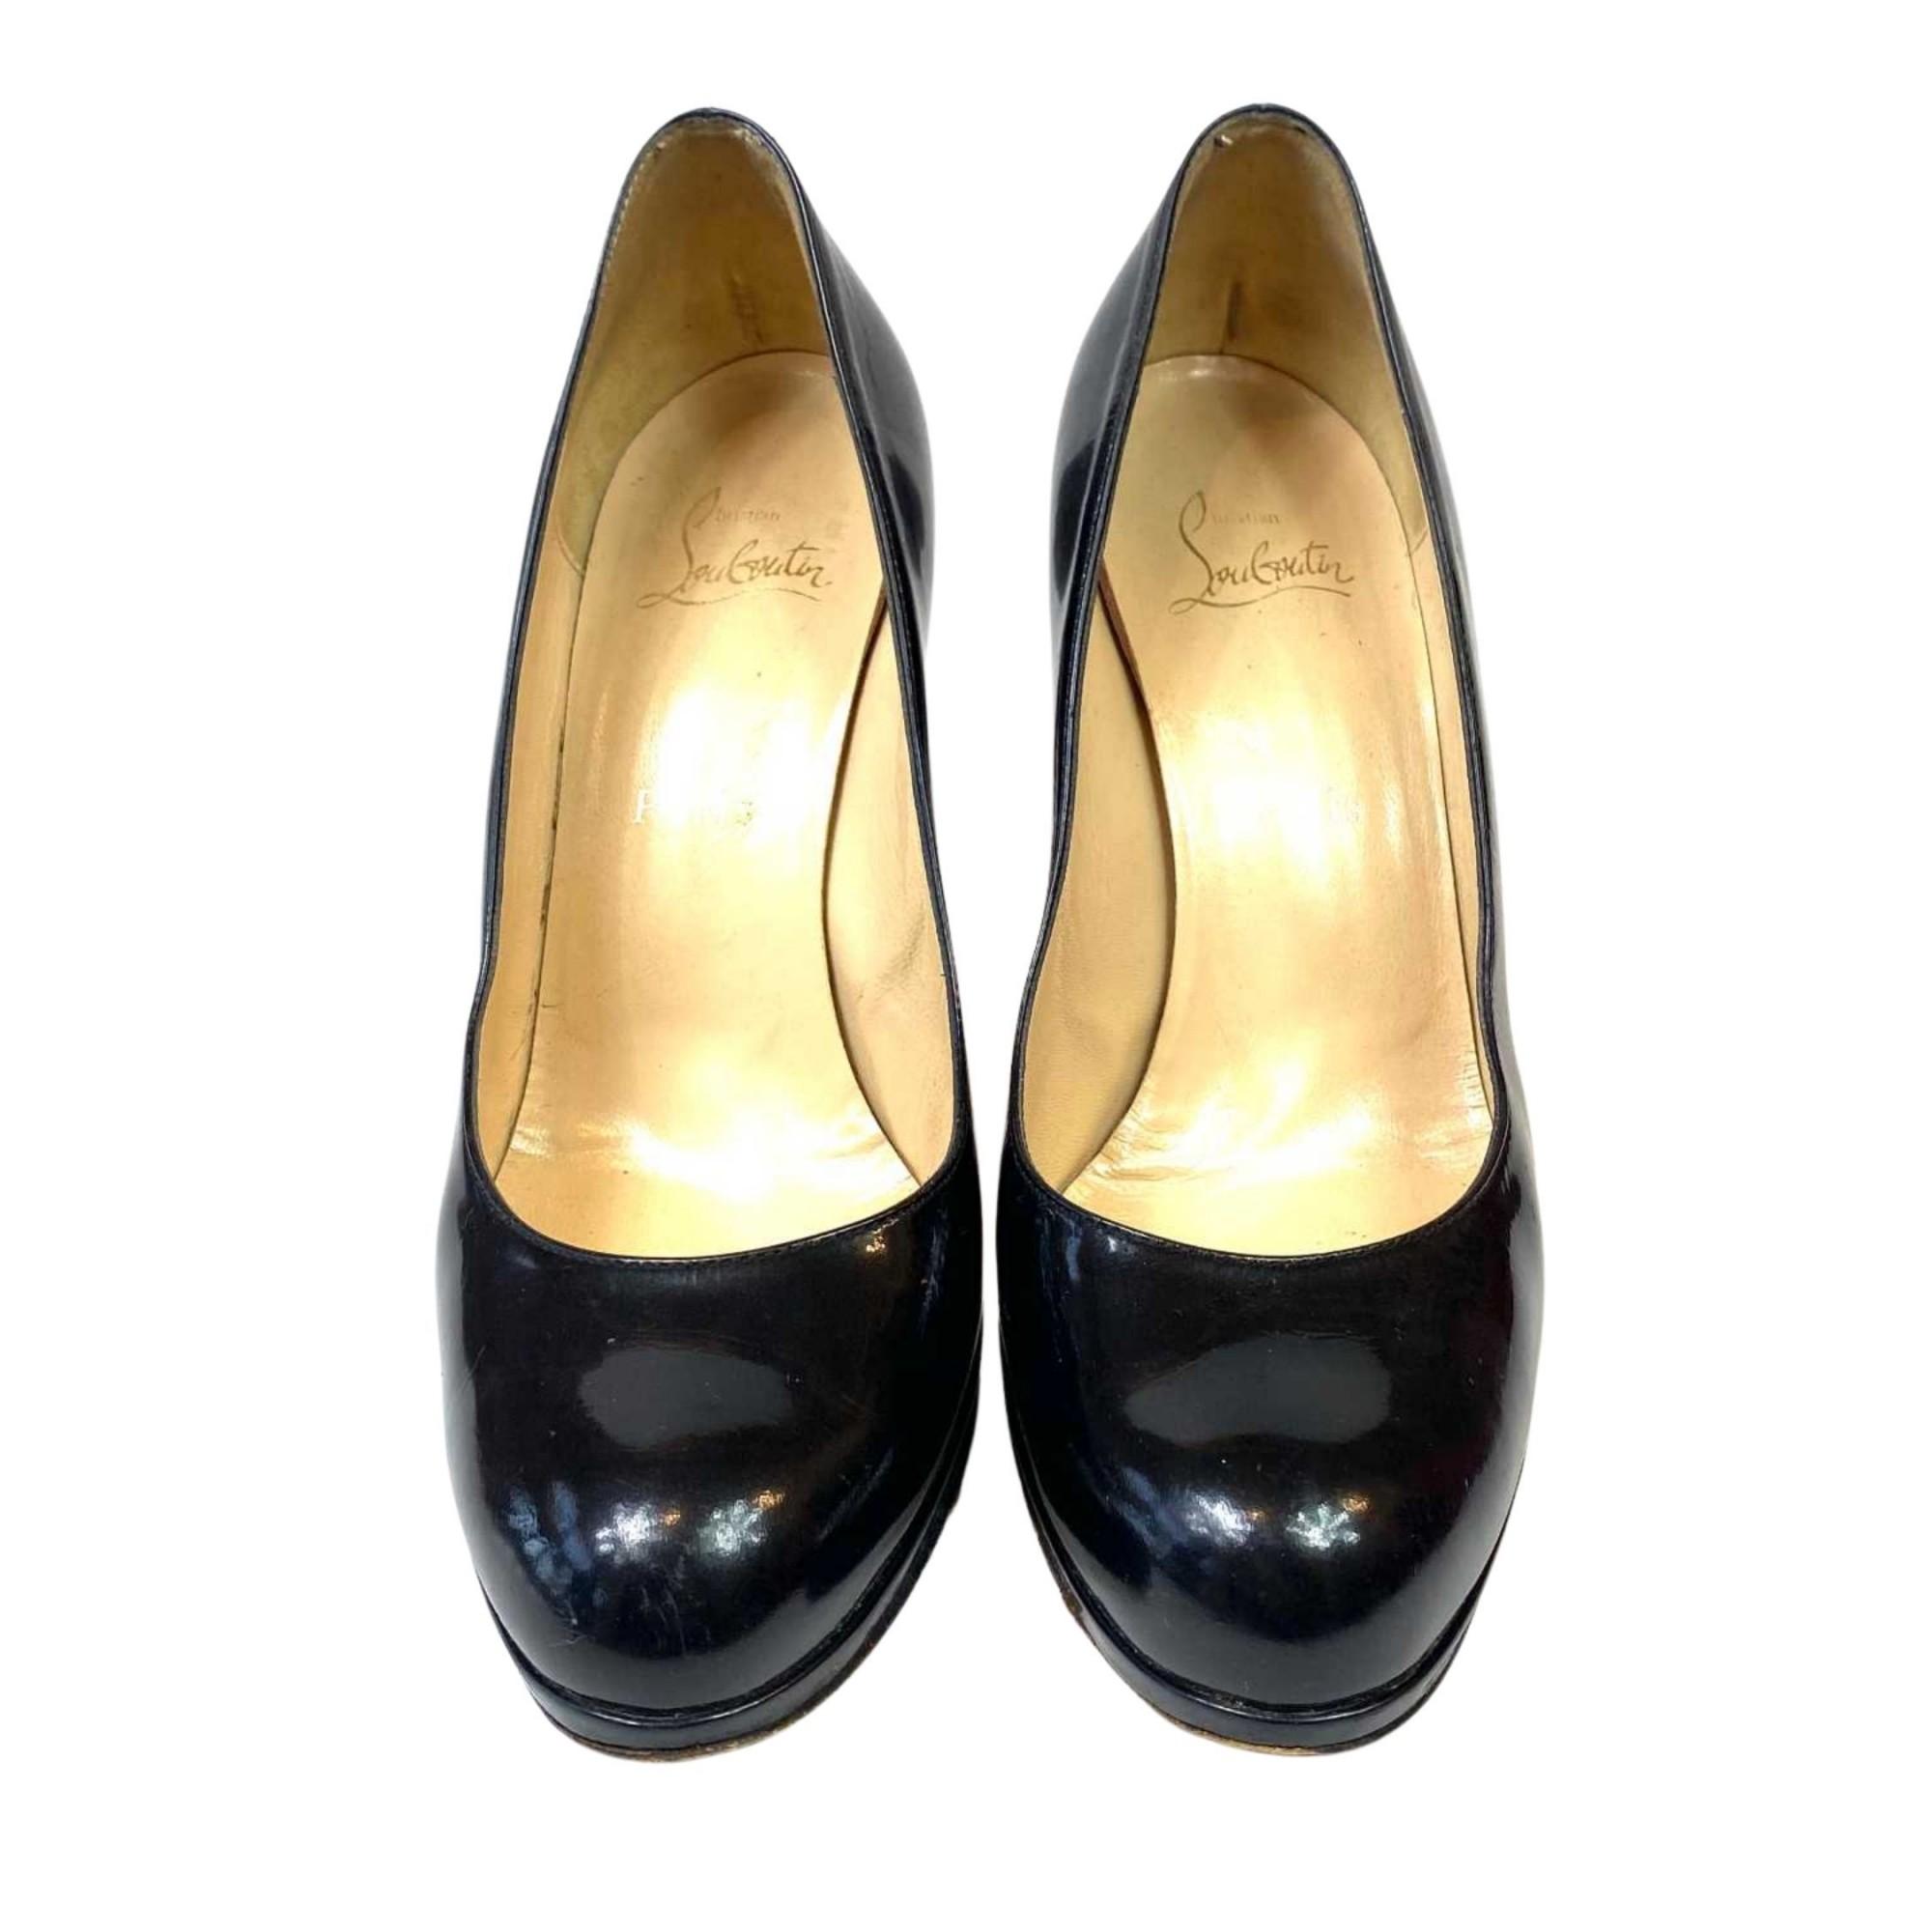 Sapato Louboutin Pump Verniz Preto